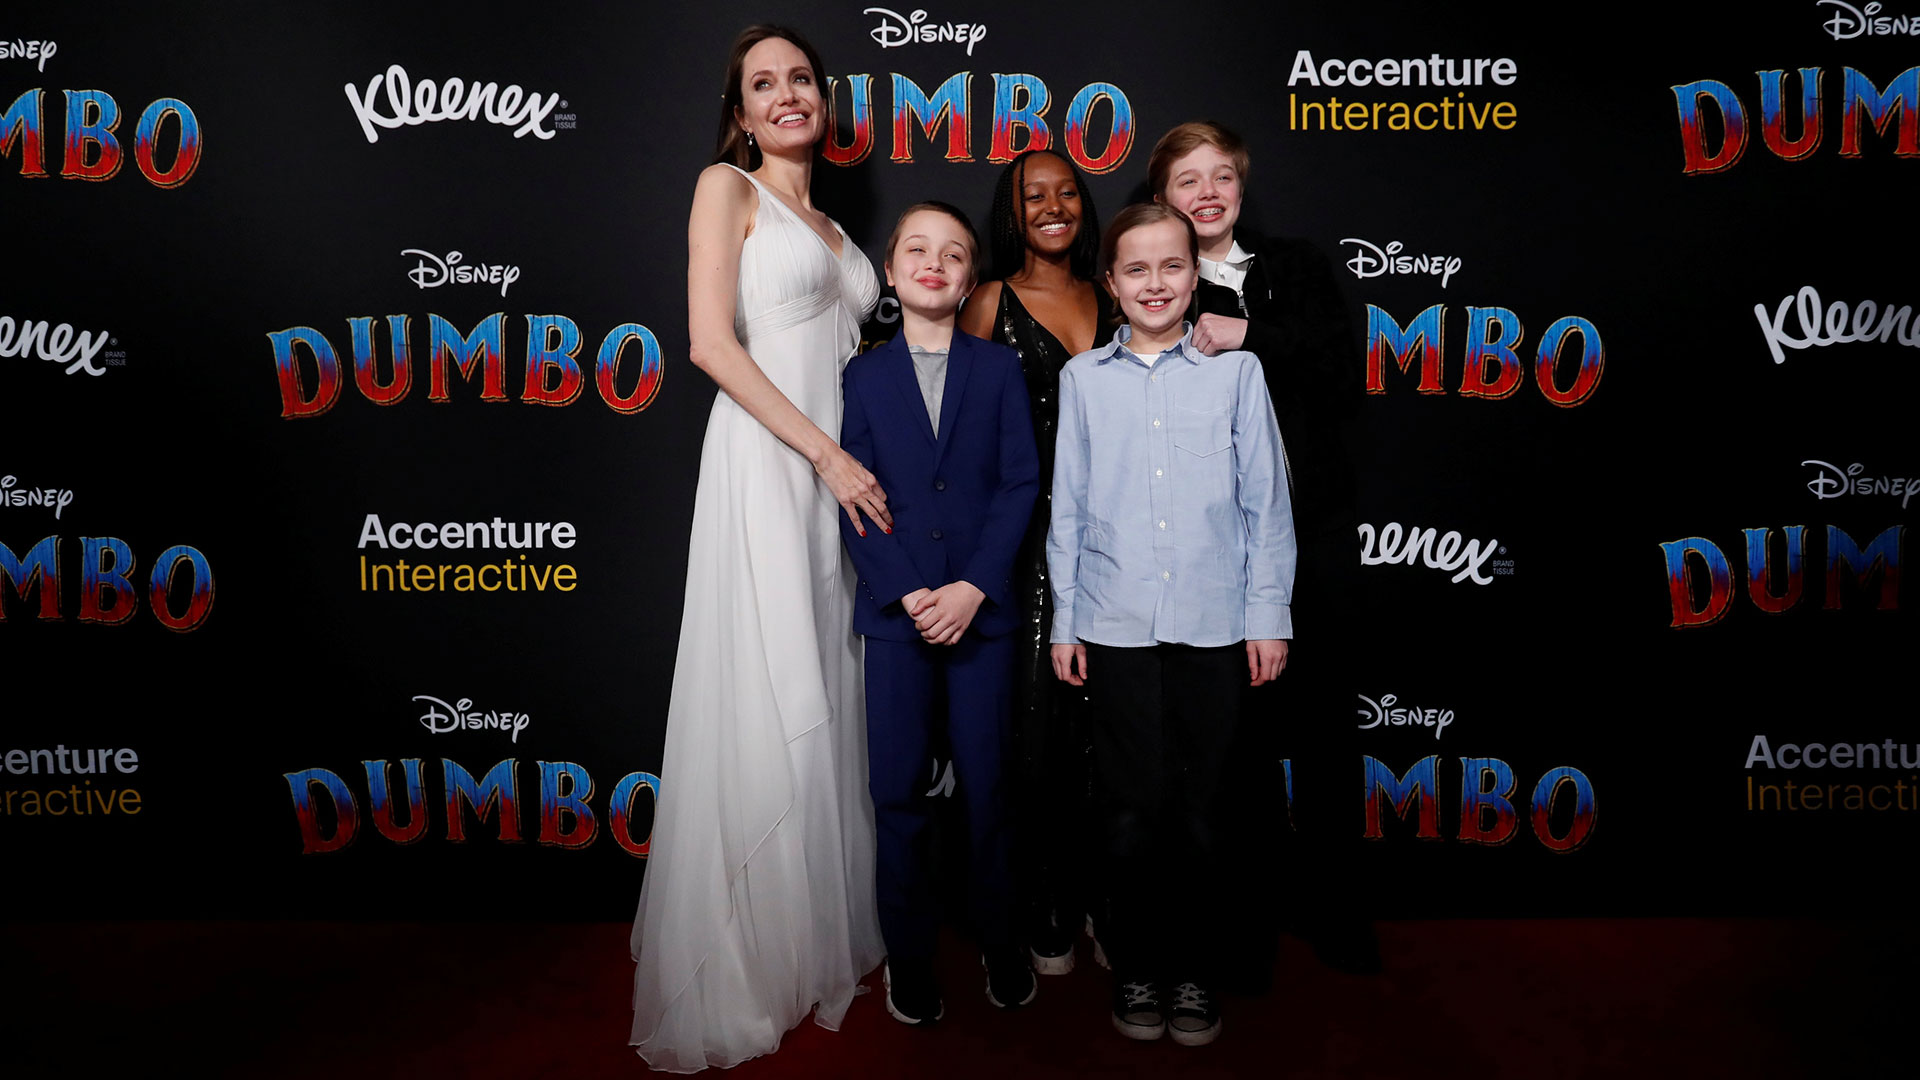 Angelina Jolie junto a cuatro de sus hijos, Knox Leon Jolie-Pitt, Zahara Marley Jolie-Pitt, Vivienne Marcheline Jolie-Pitt y Shiloh Nouvel Jolie-Pitt en la premiere de Dumbo en Los Ángeles